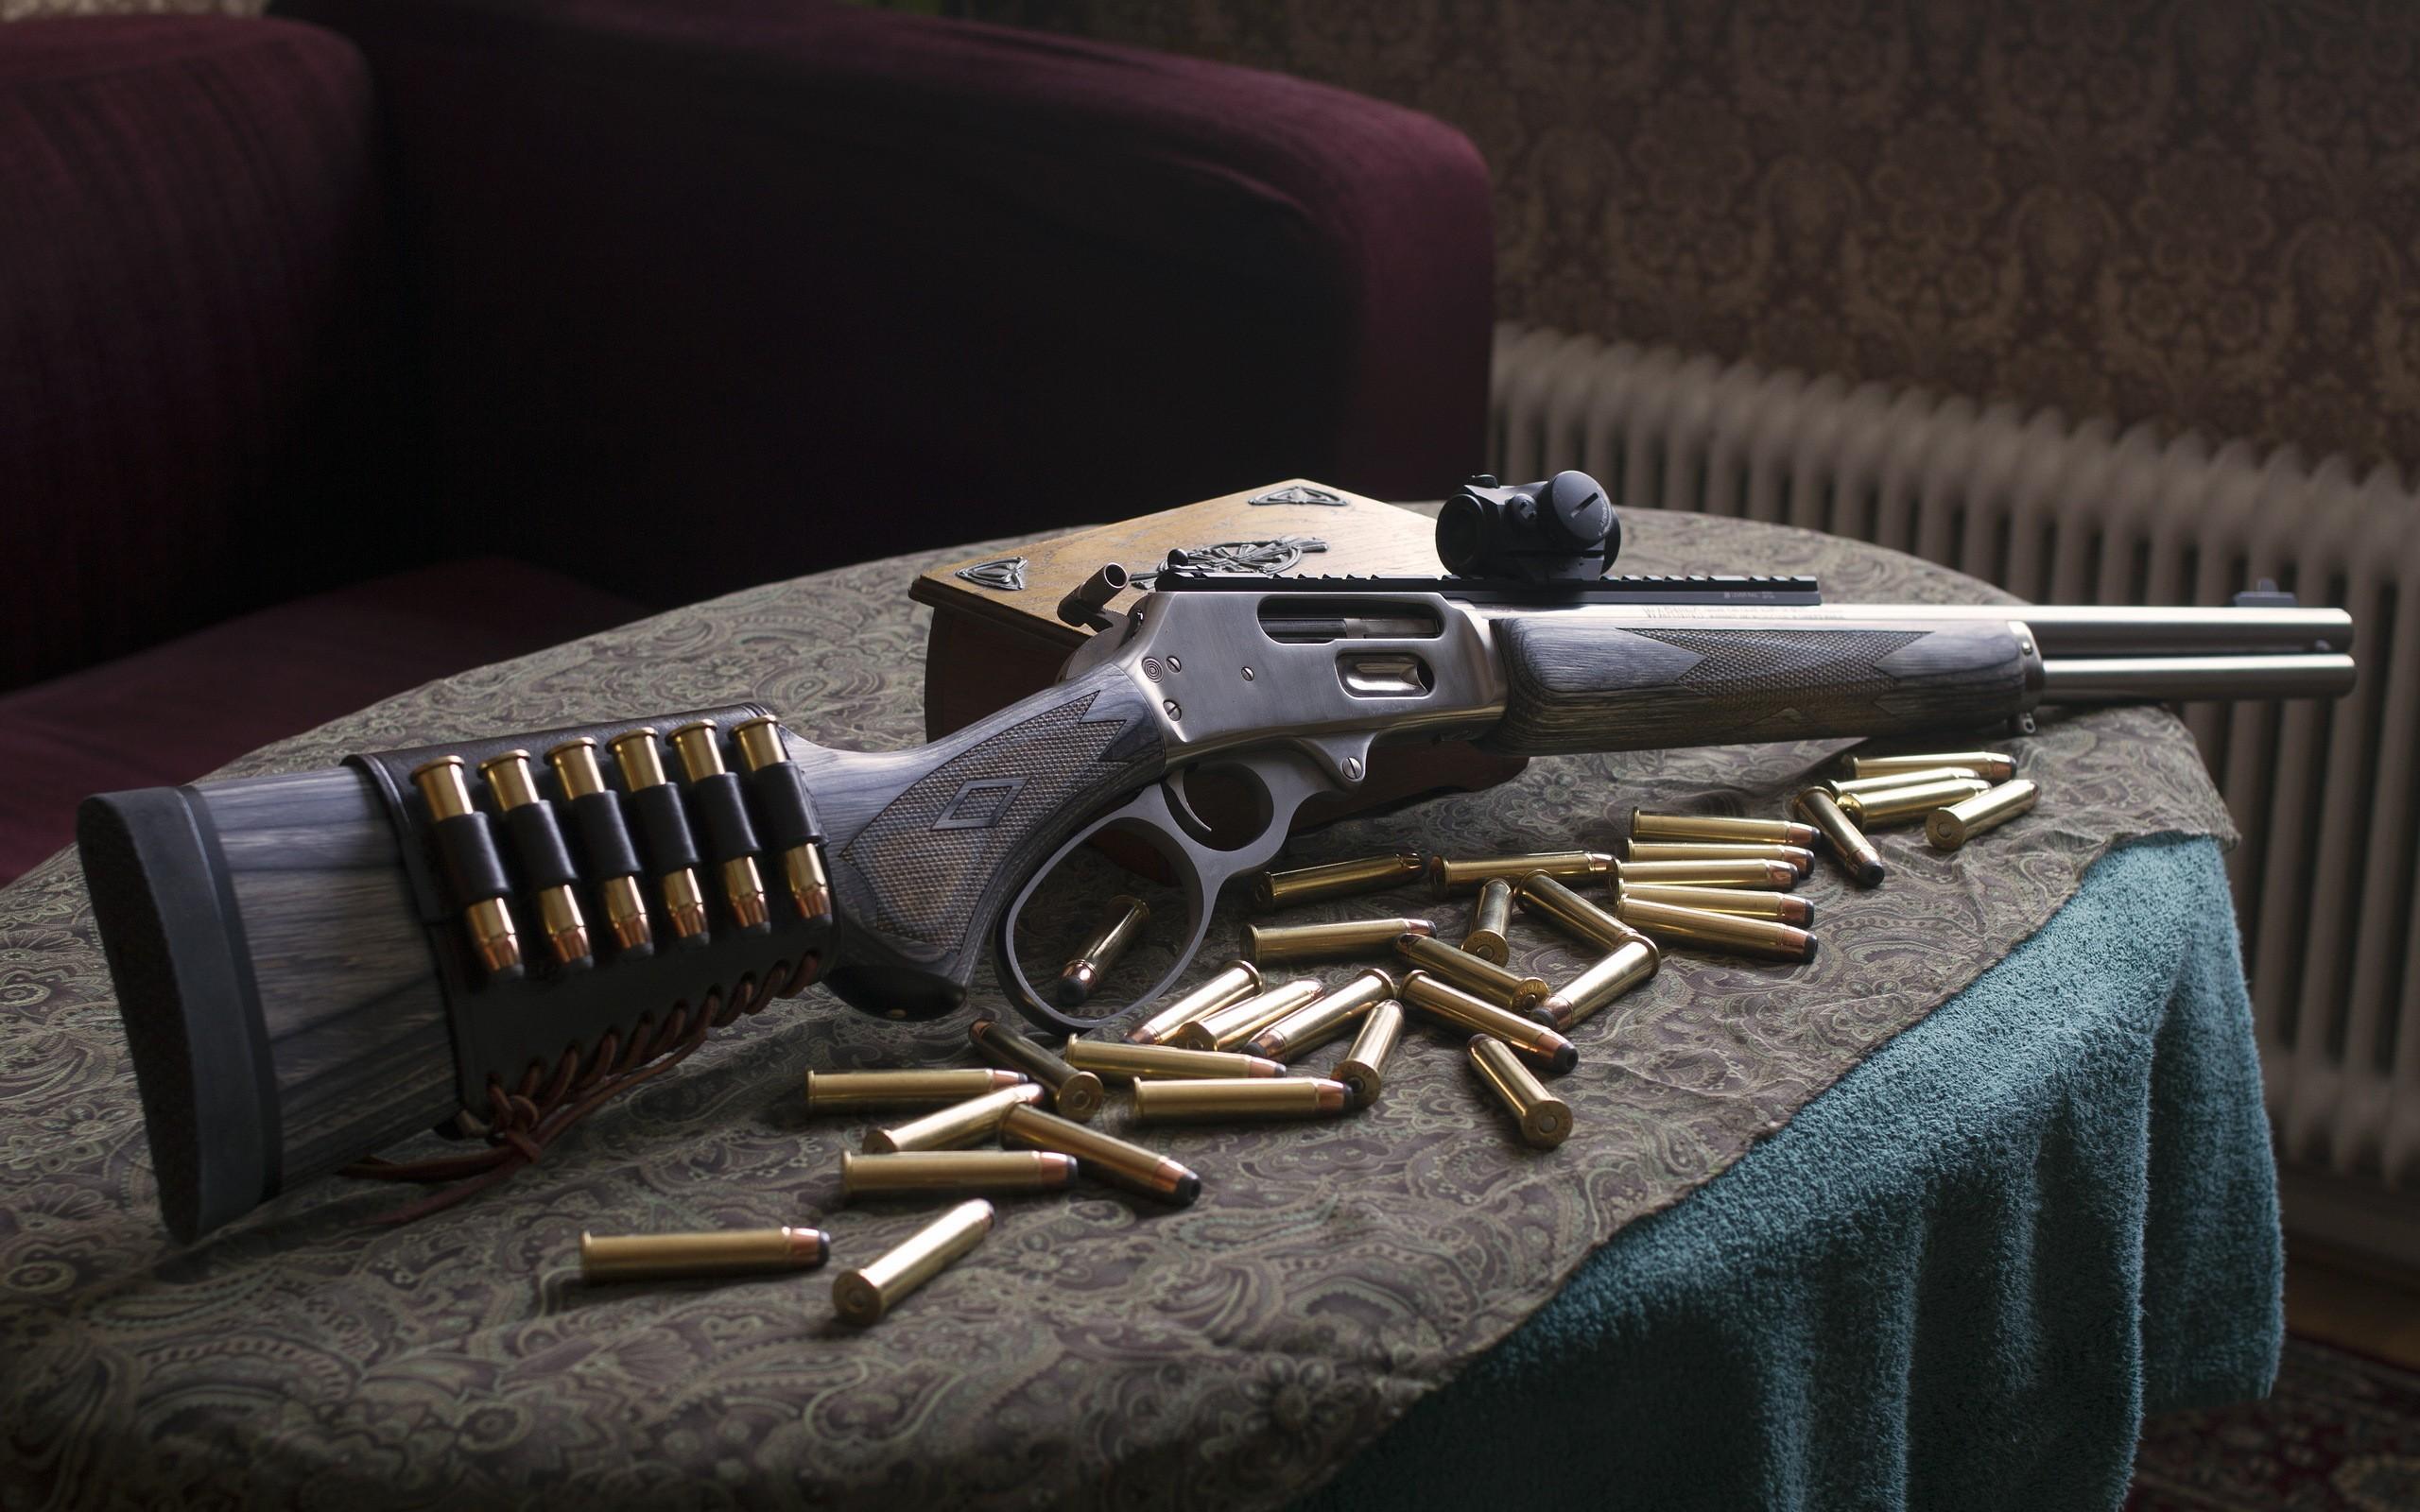 rifles guns weapons ammunition winchester Lever action 30 2560x1600